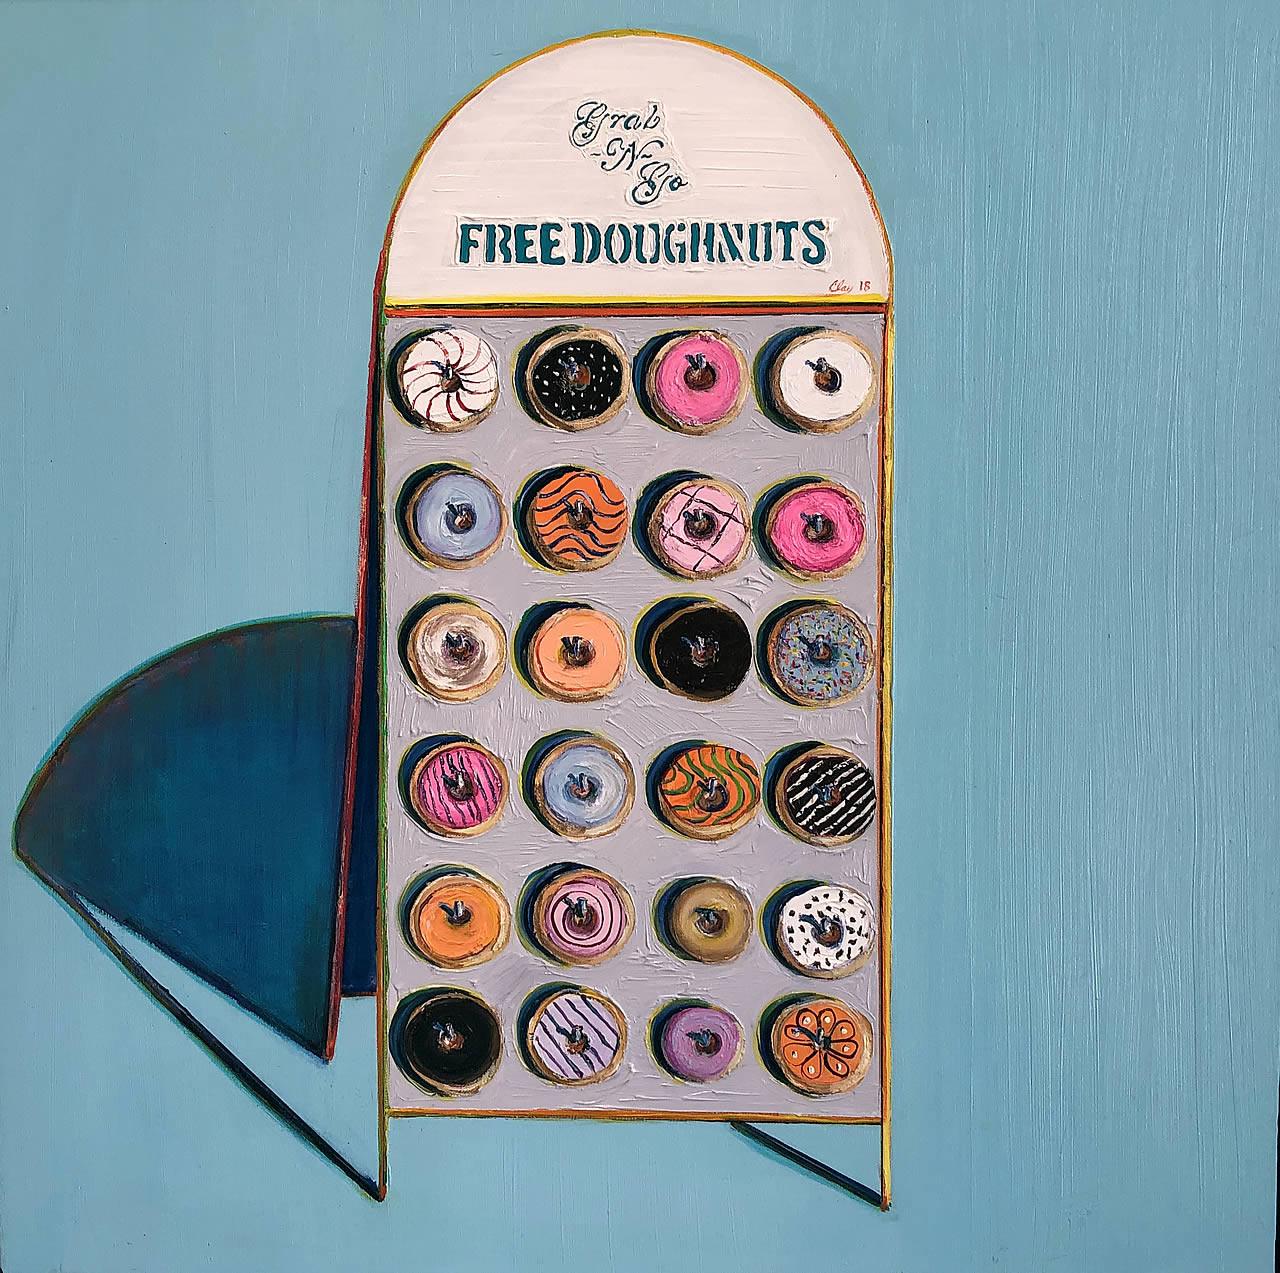 Free Doughnuts